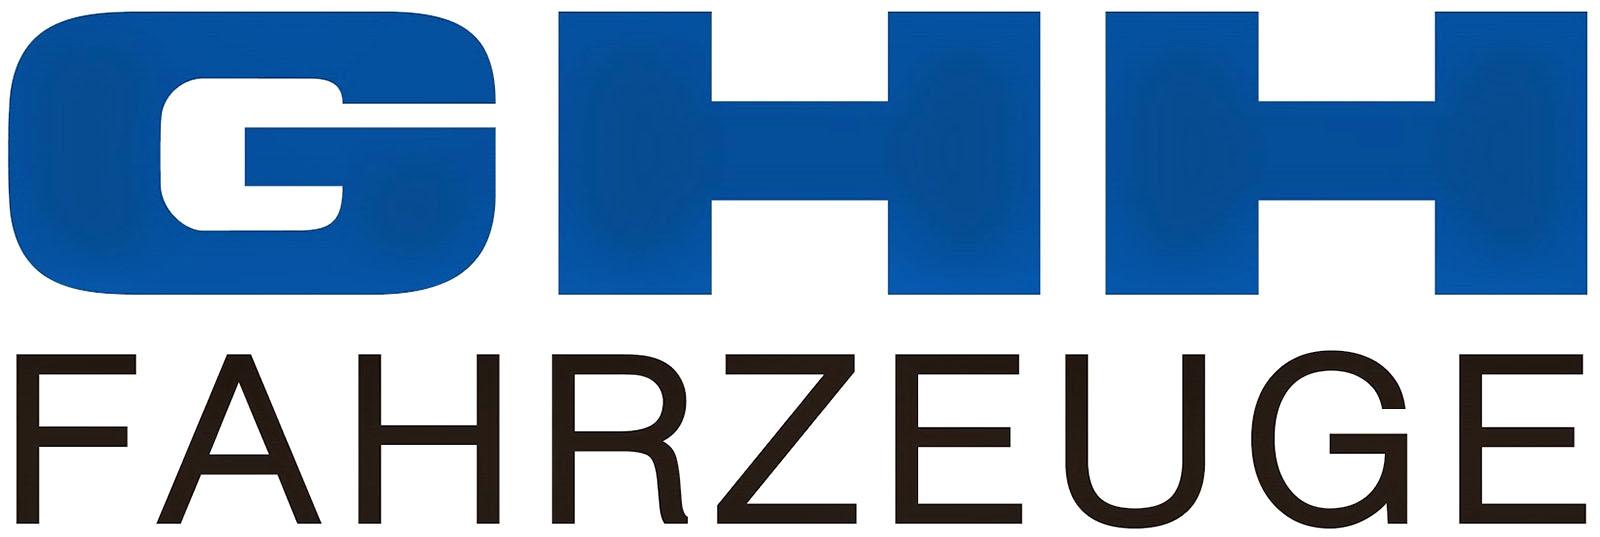 http://million-base.com/wp-content/uploads/2015/04/10-GHH-Fahrzeuge-Logo.jpg